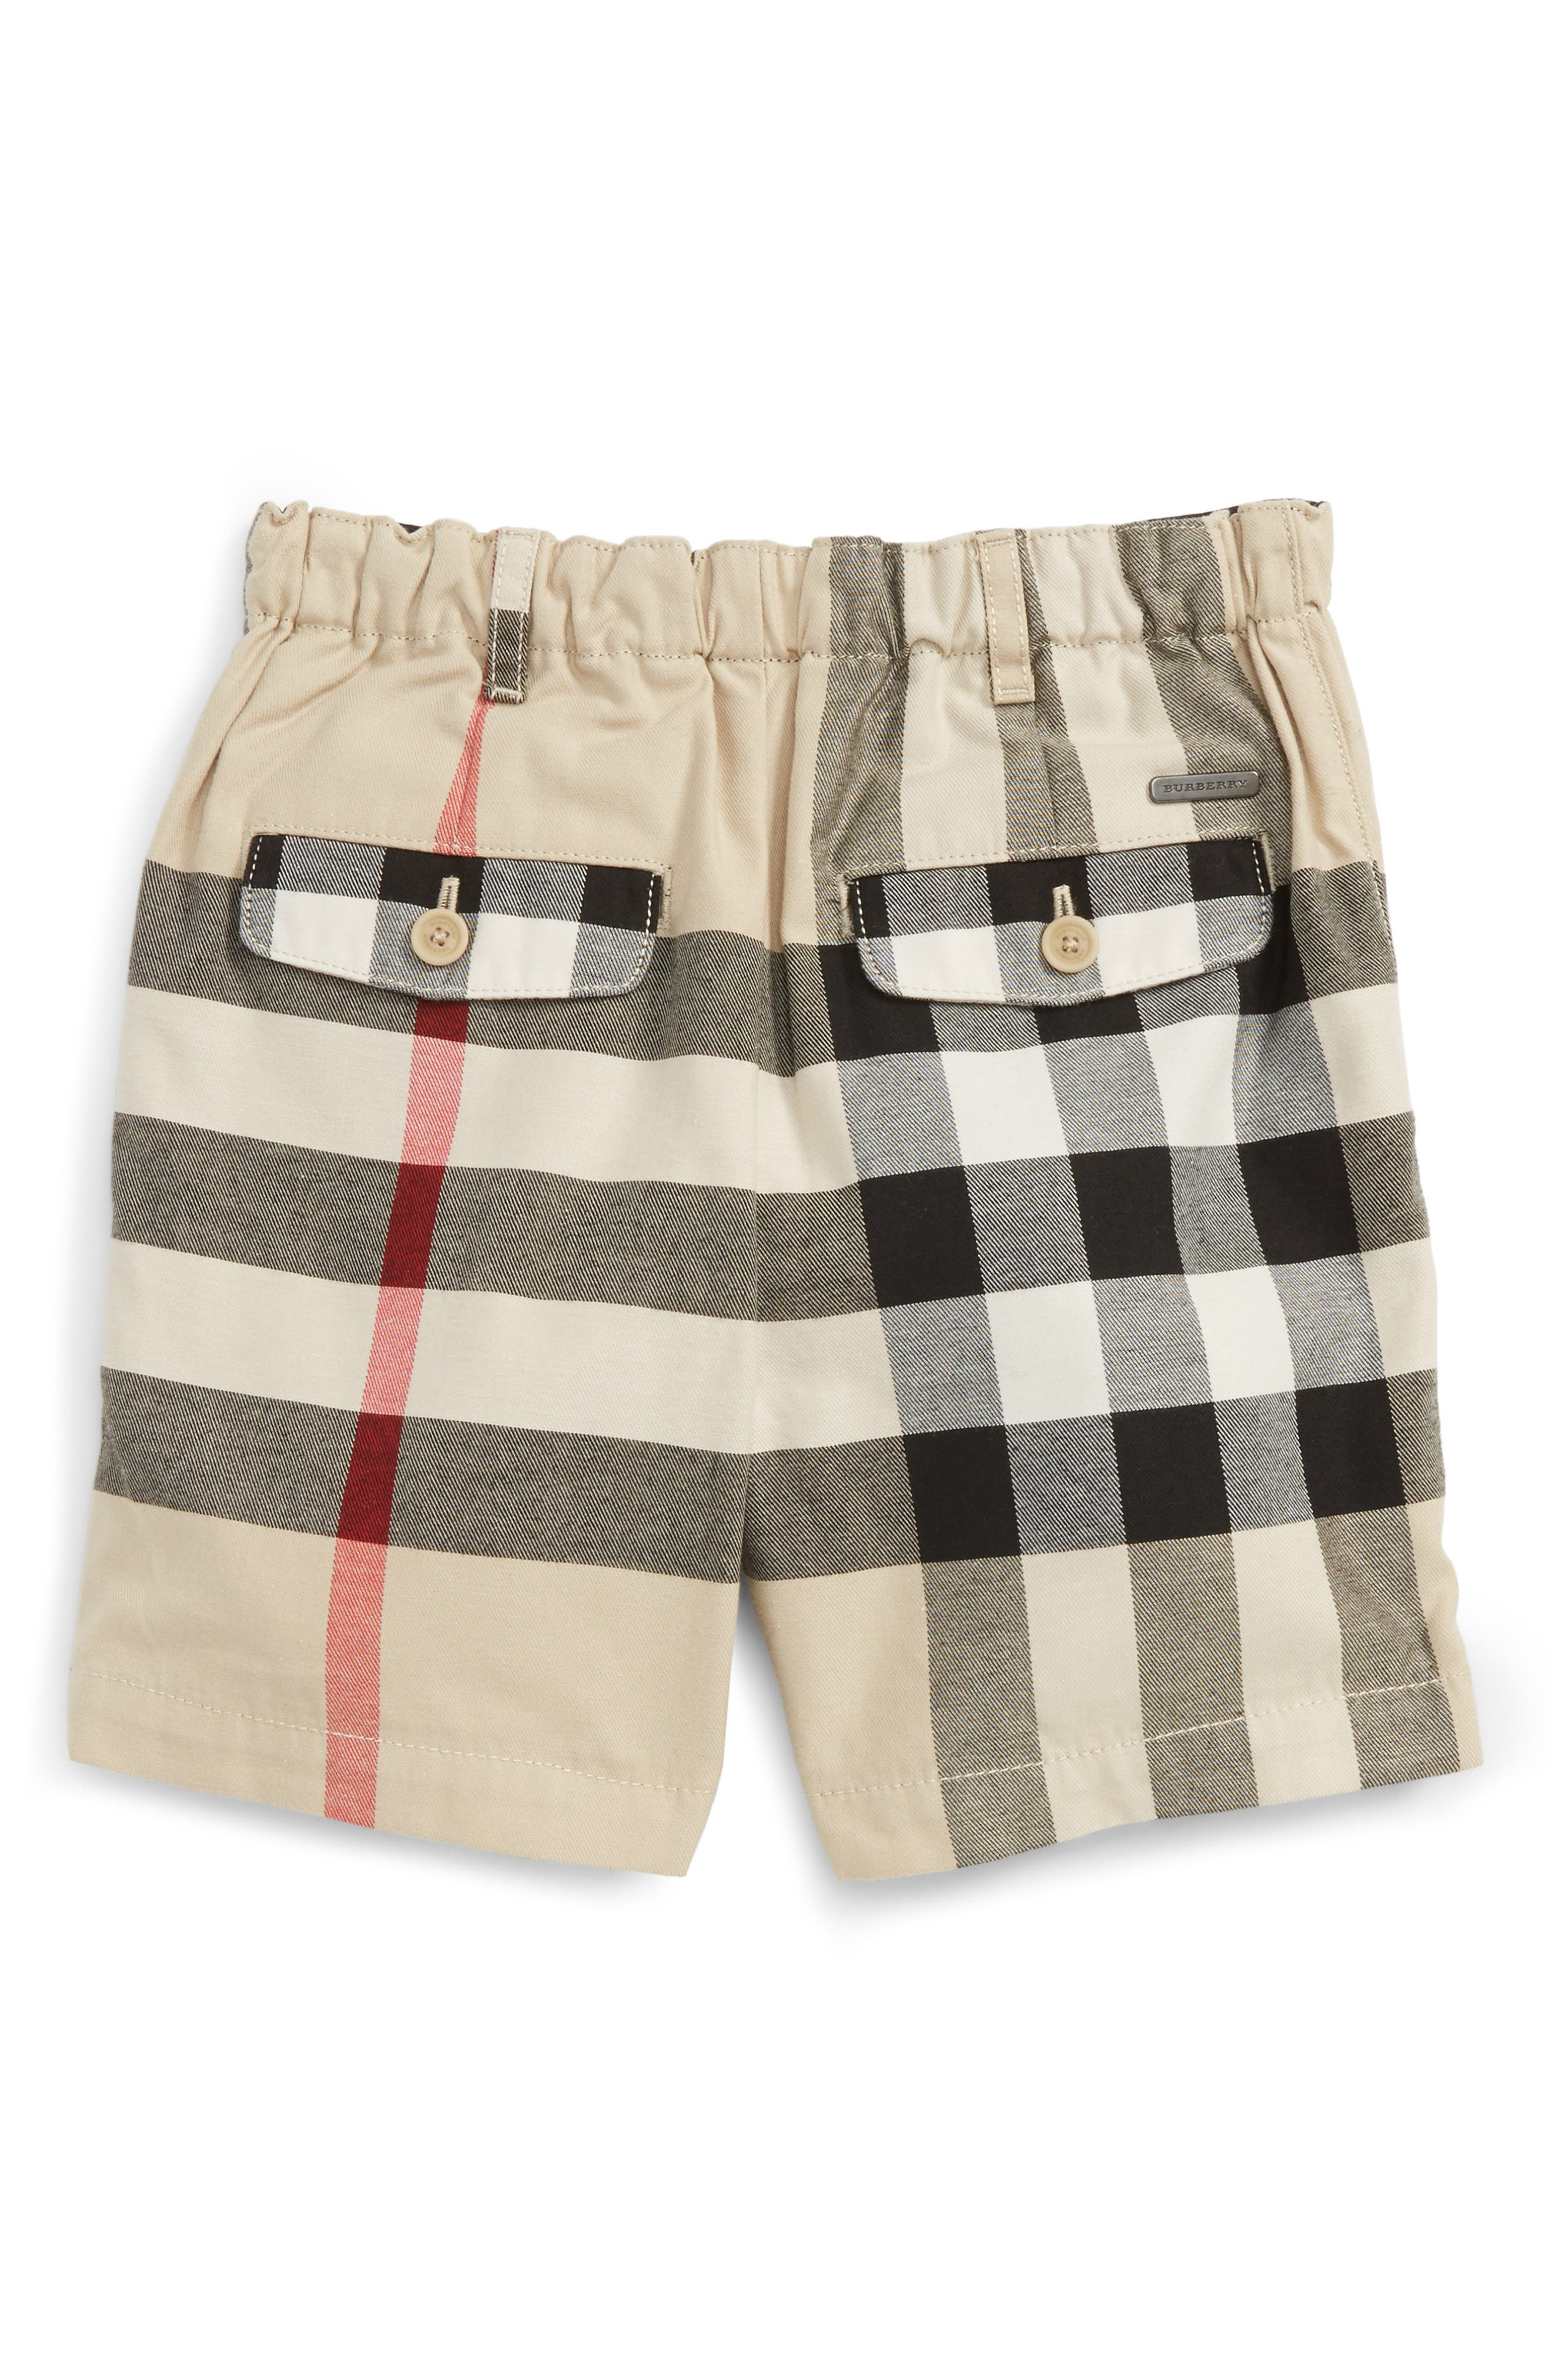 BURBERRY,                             Sean Check Print Shorts,                             Alternate thumbnail 2, color,                             250